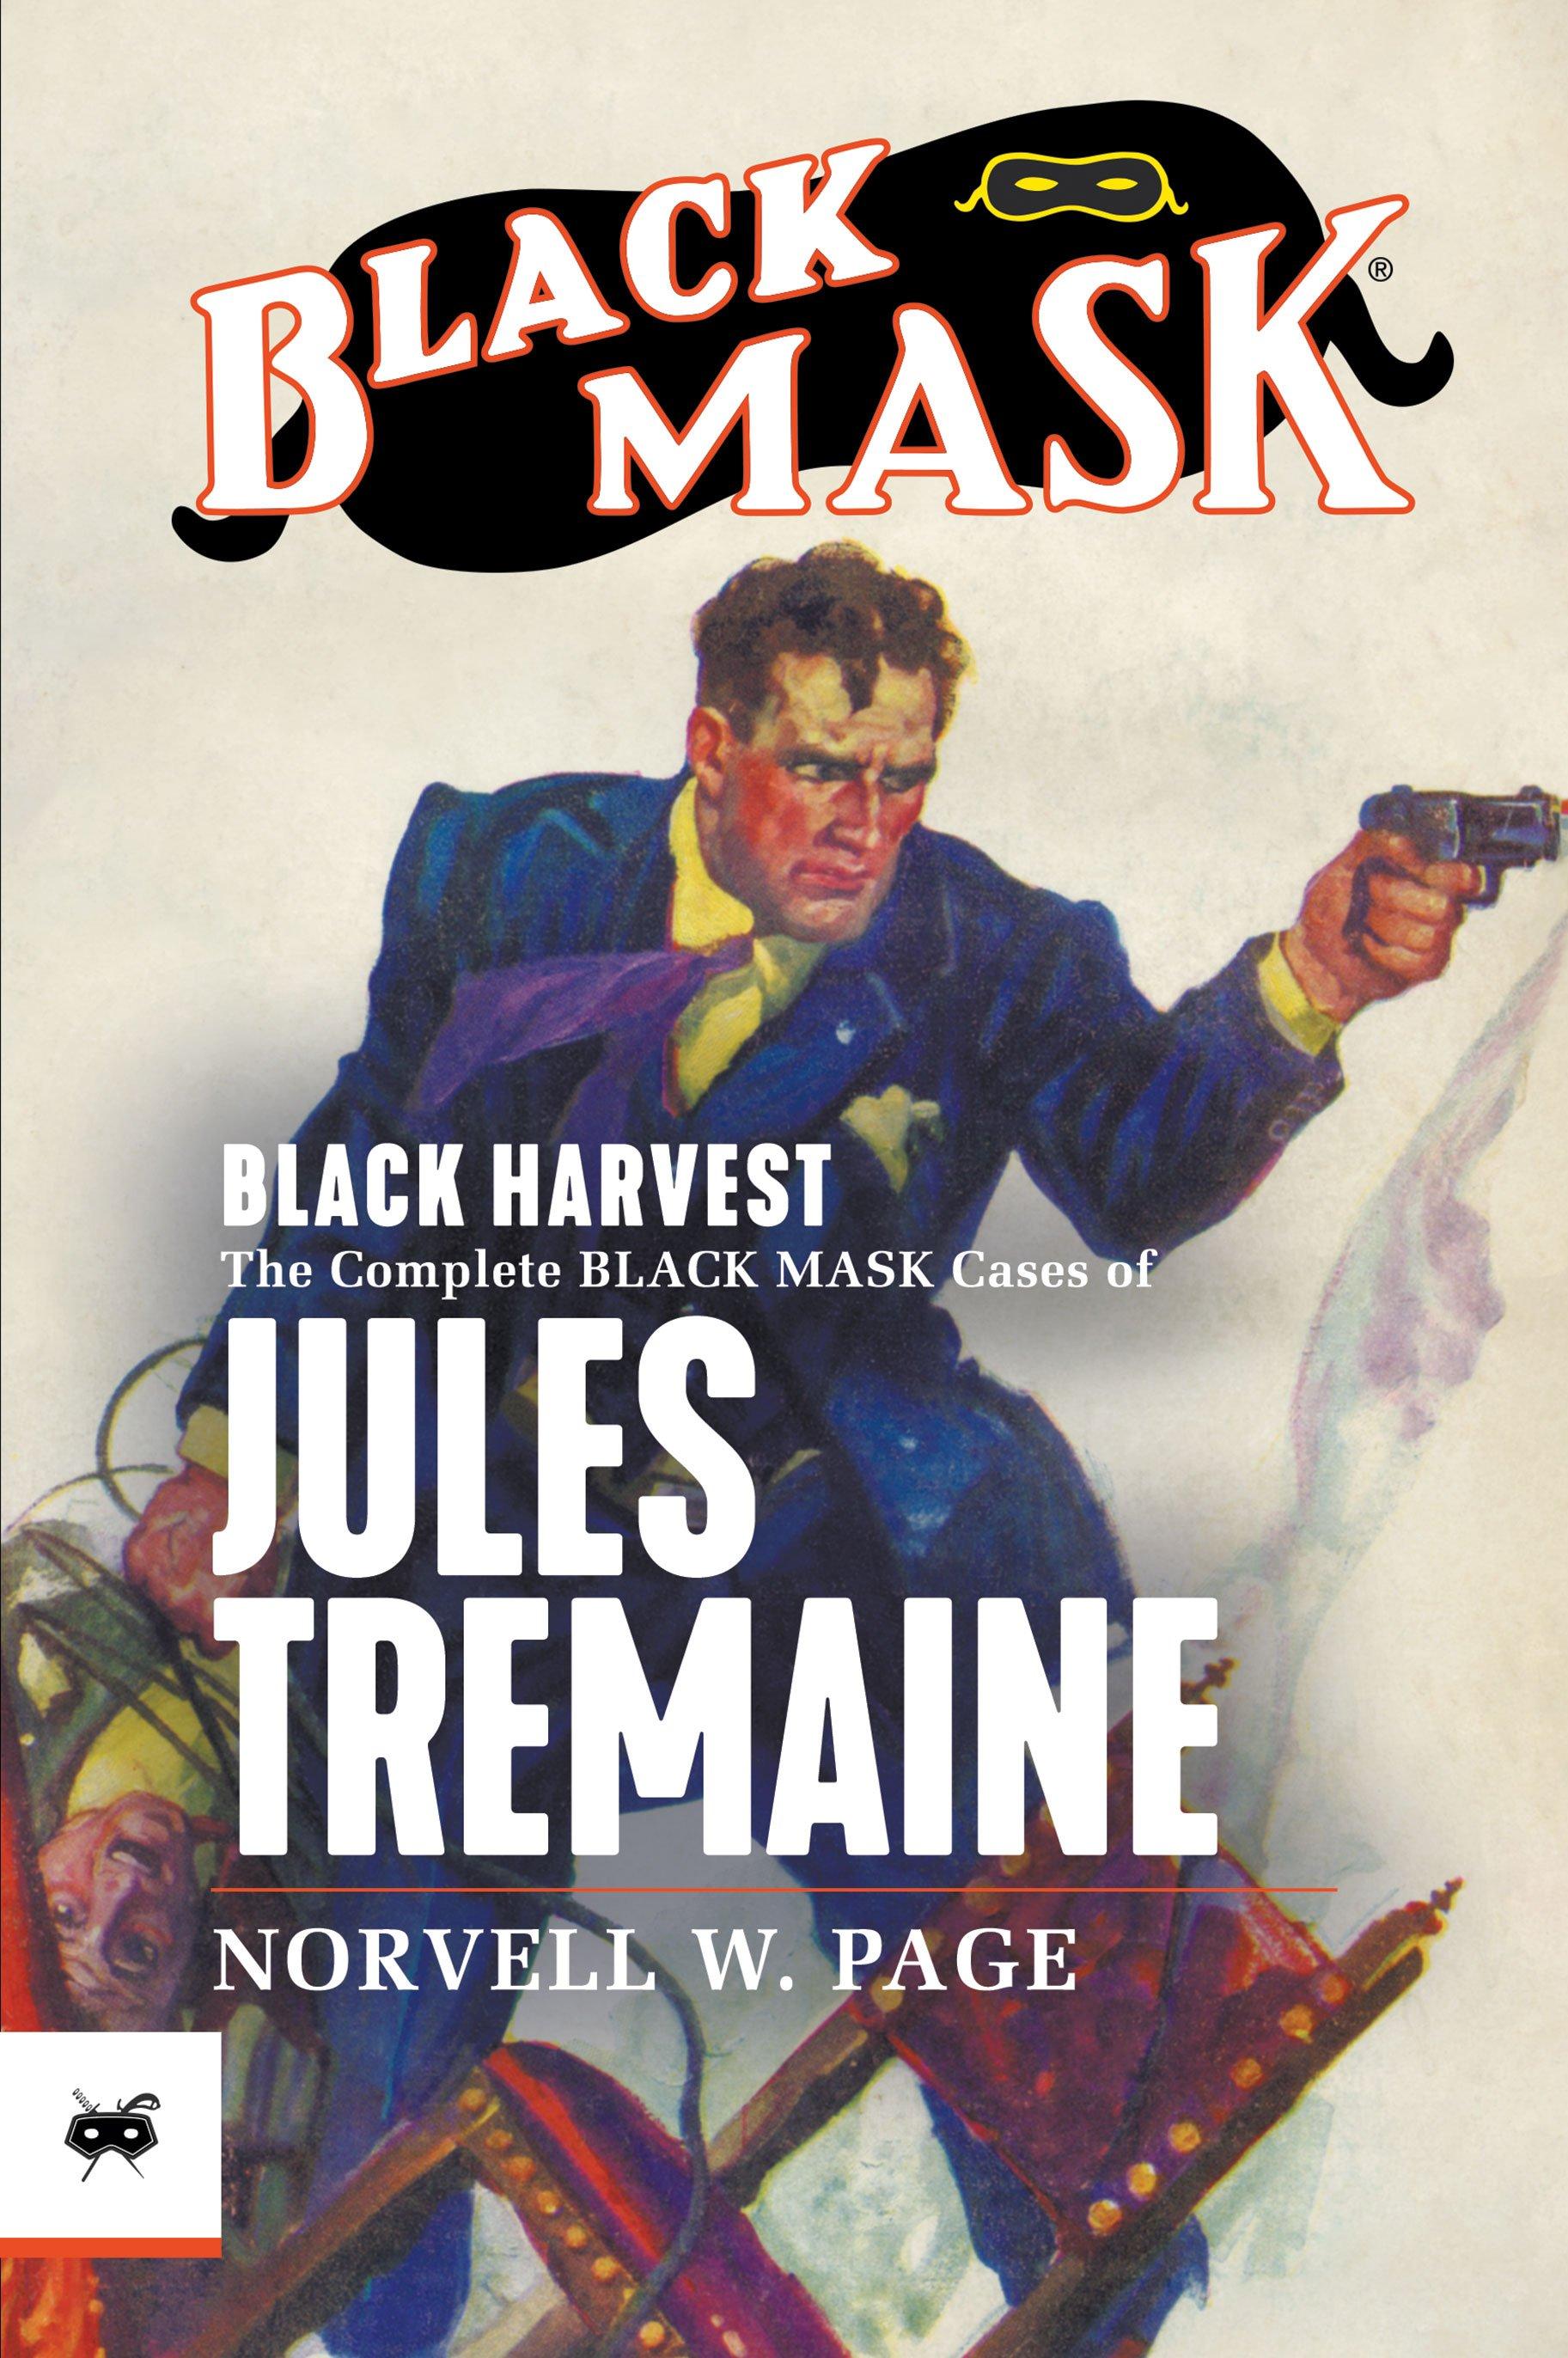 Black Harvest: The Complete Black Mask Cases of Jules Tremaine